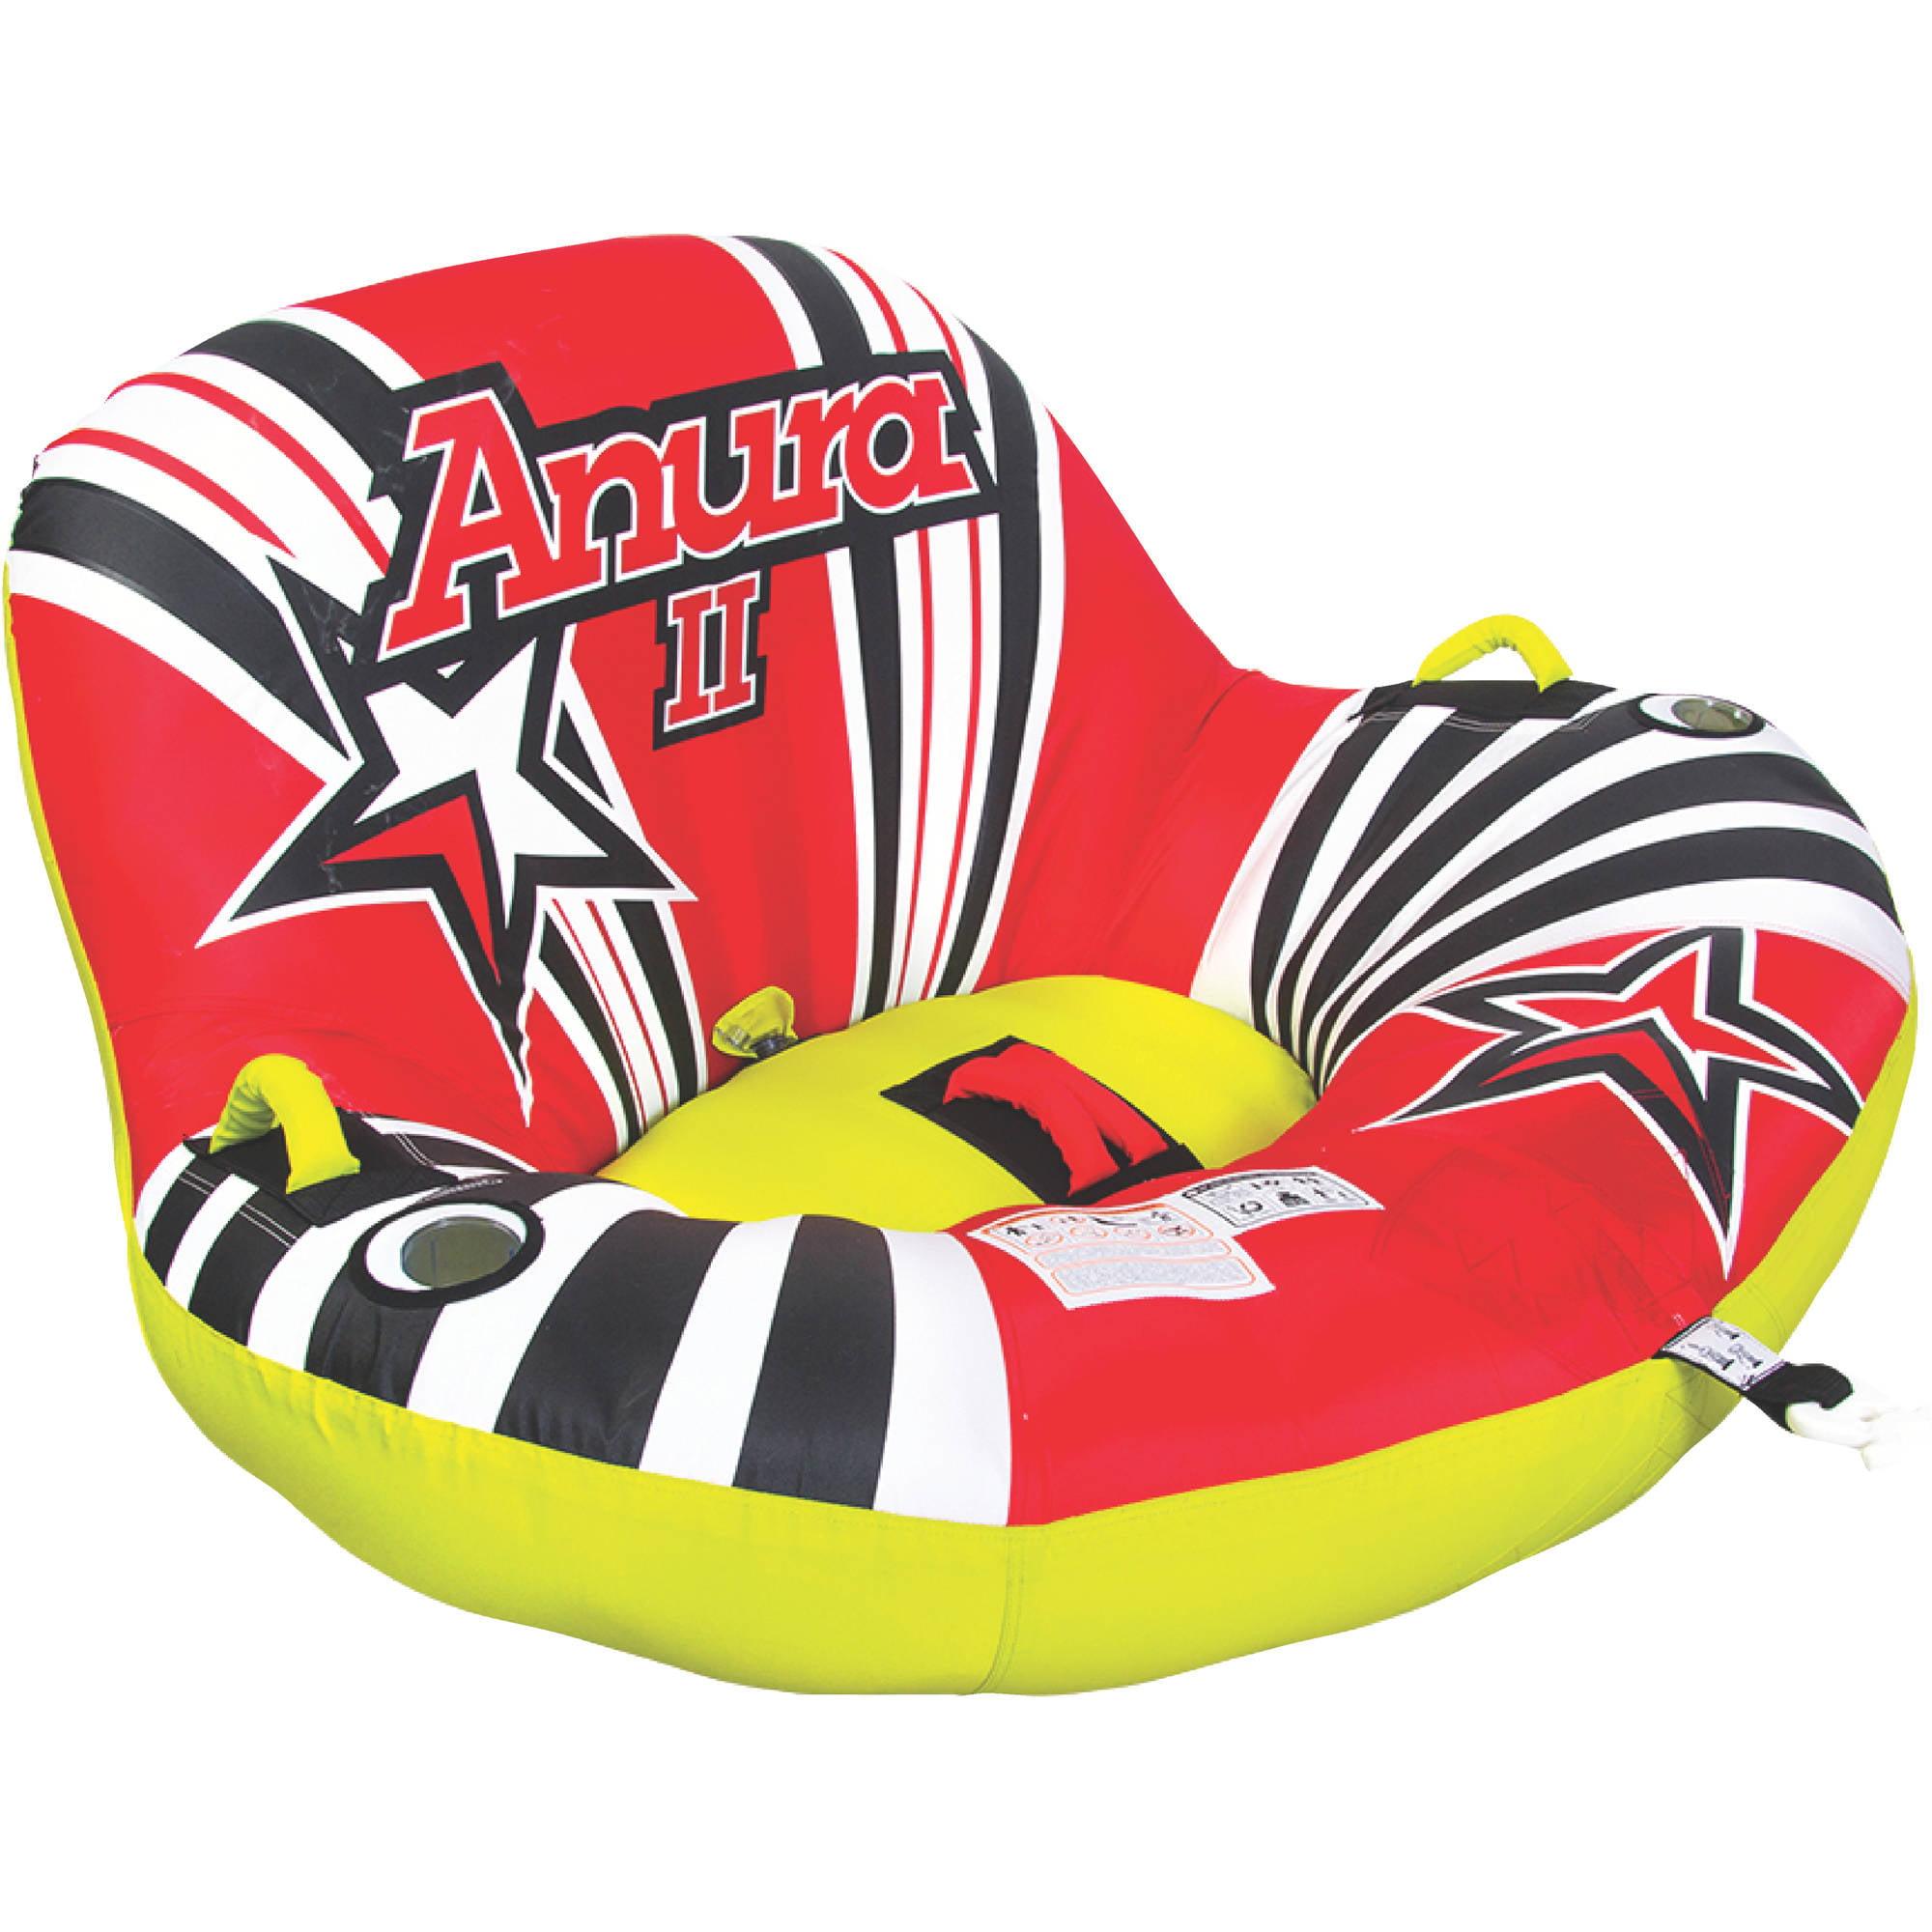 Jobe 230216001 Anura 2 Person Inflatable Towable by Jobe Sport International